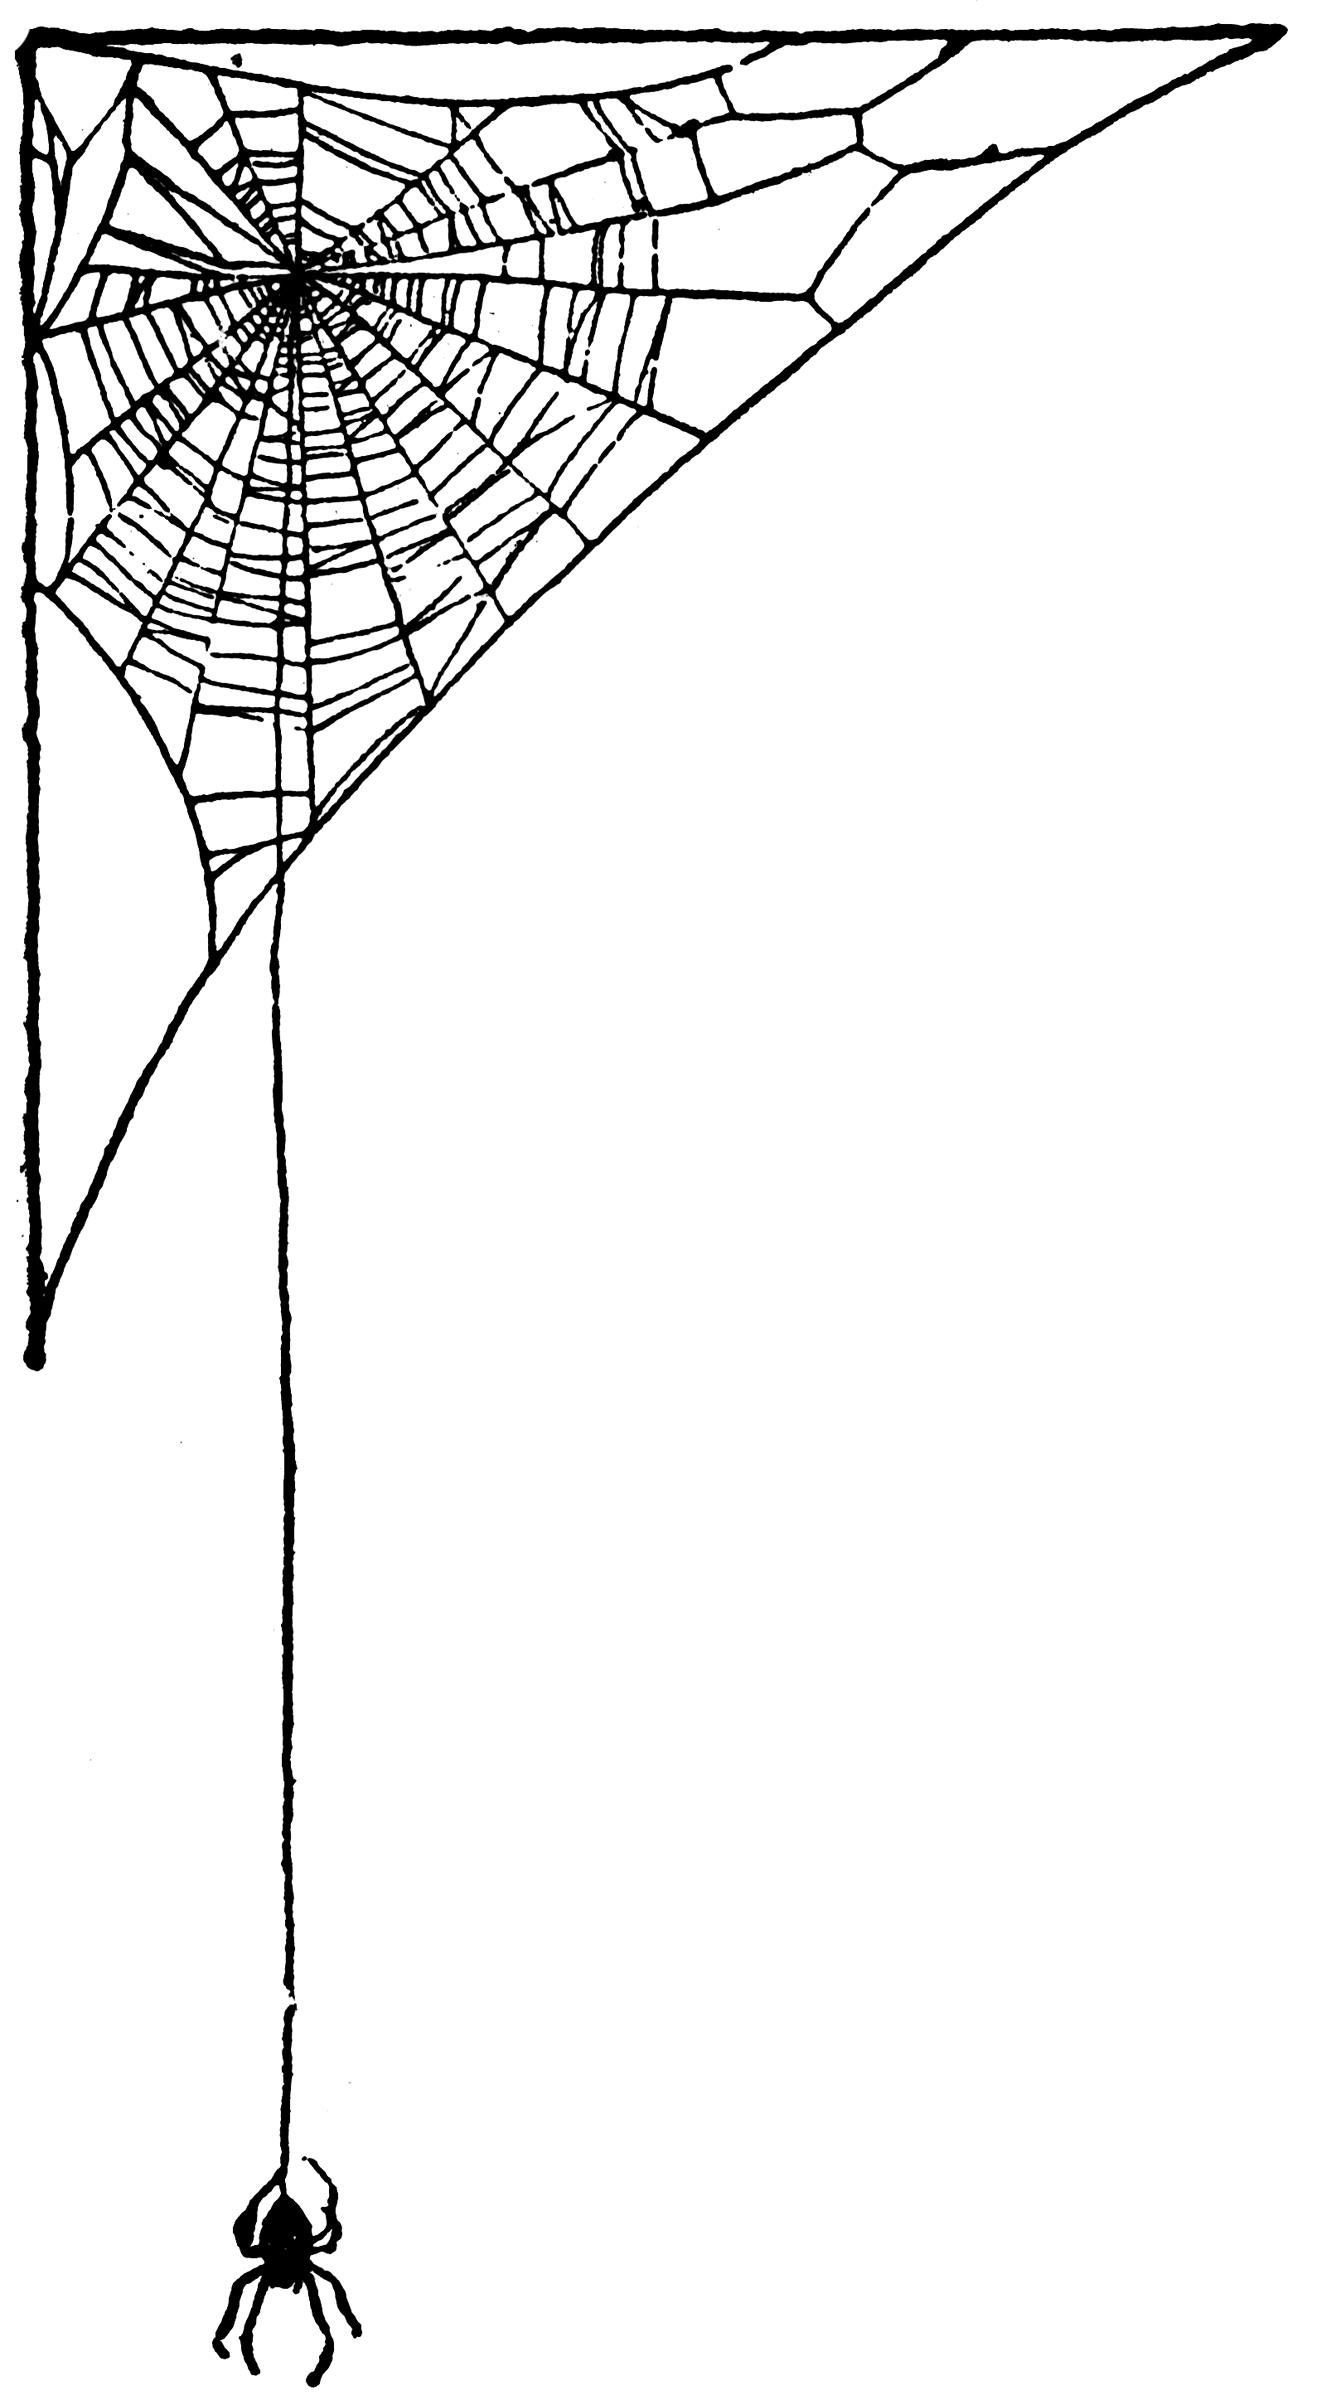 Corner spider web design - photo#13